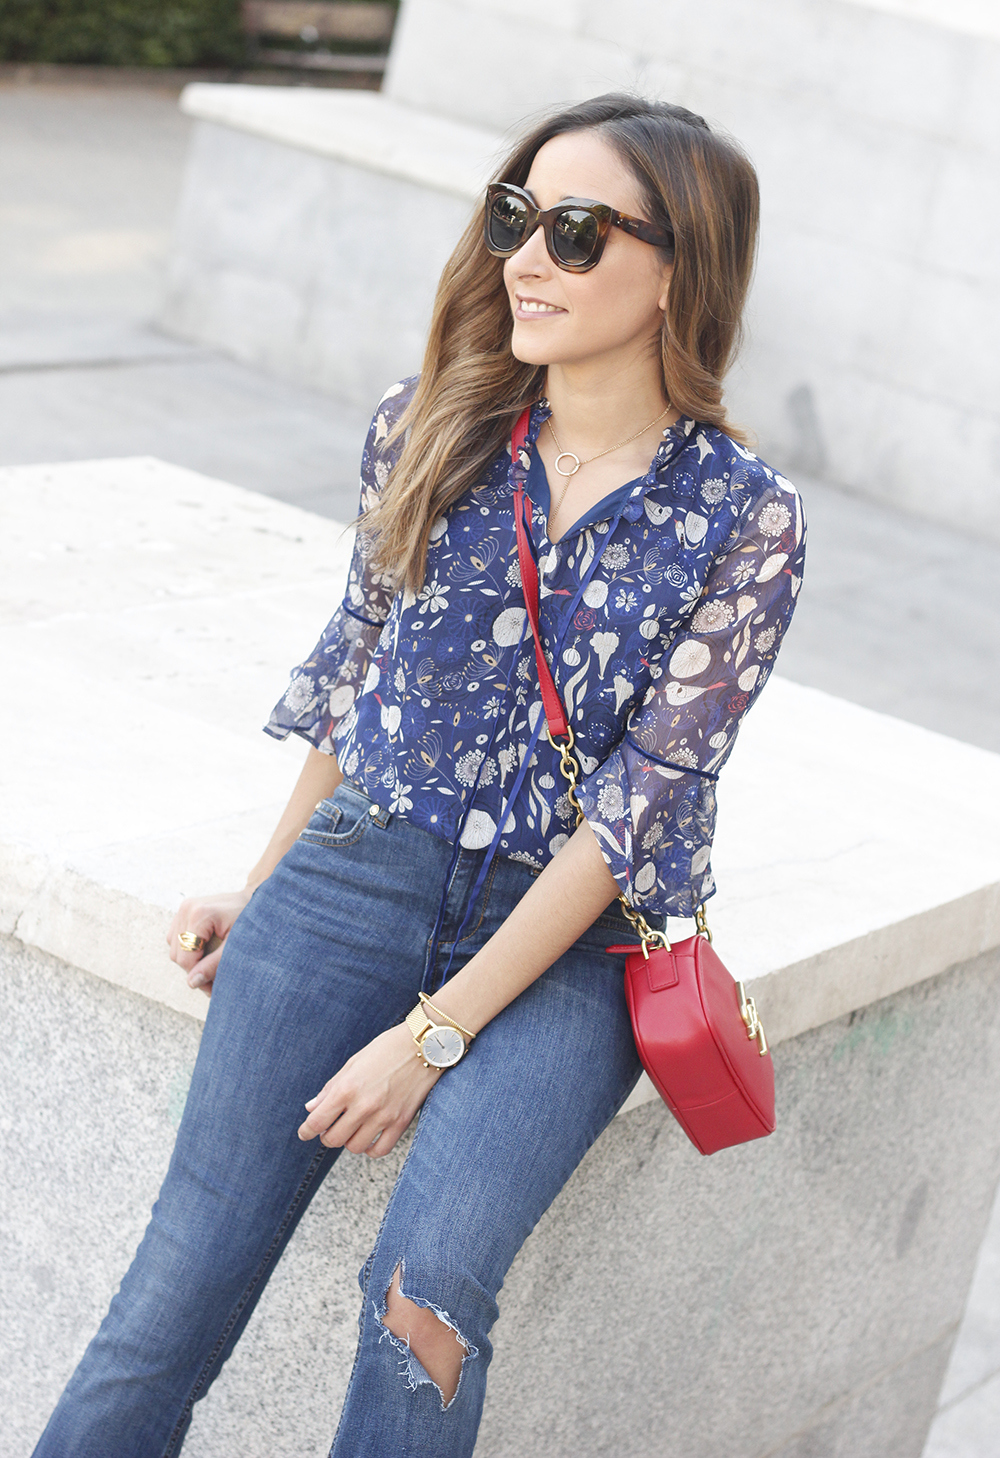 flared jeans liu jo blue blouse uterqüe boho outfit fashion style02